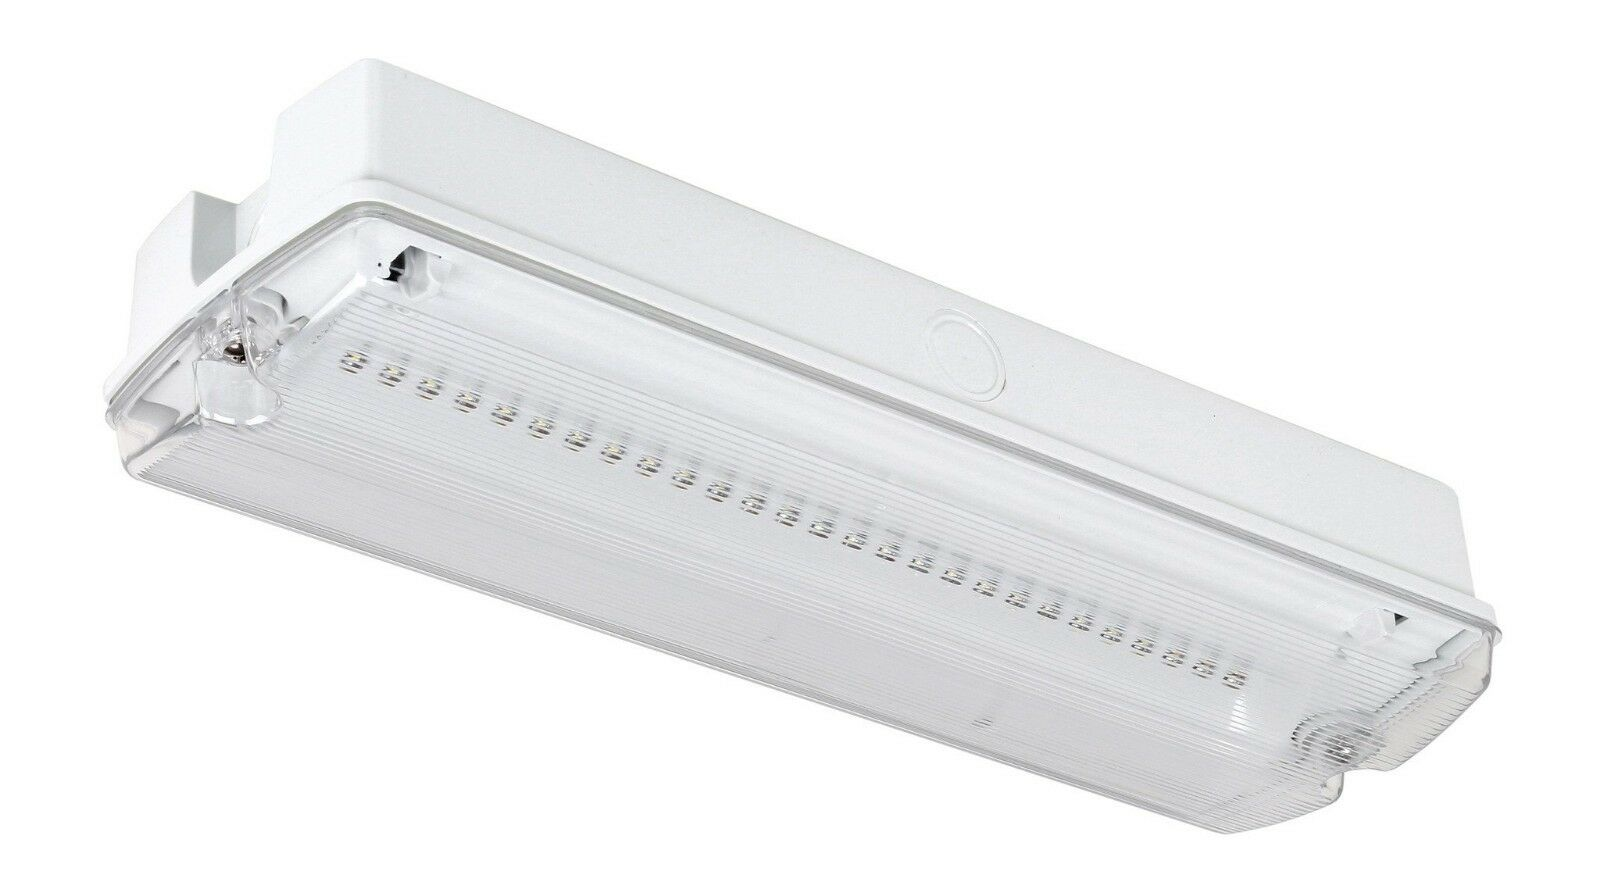 JSB Zeta III LED Emergency Light Non Maintained 3 Watt Low Energy Saving IP65